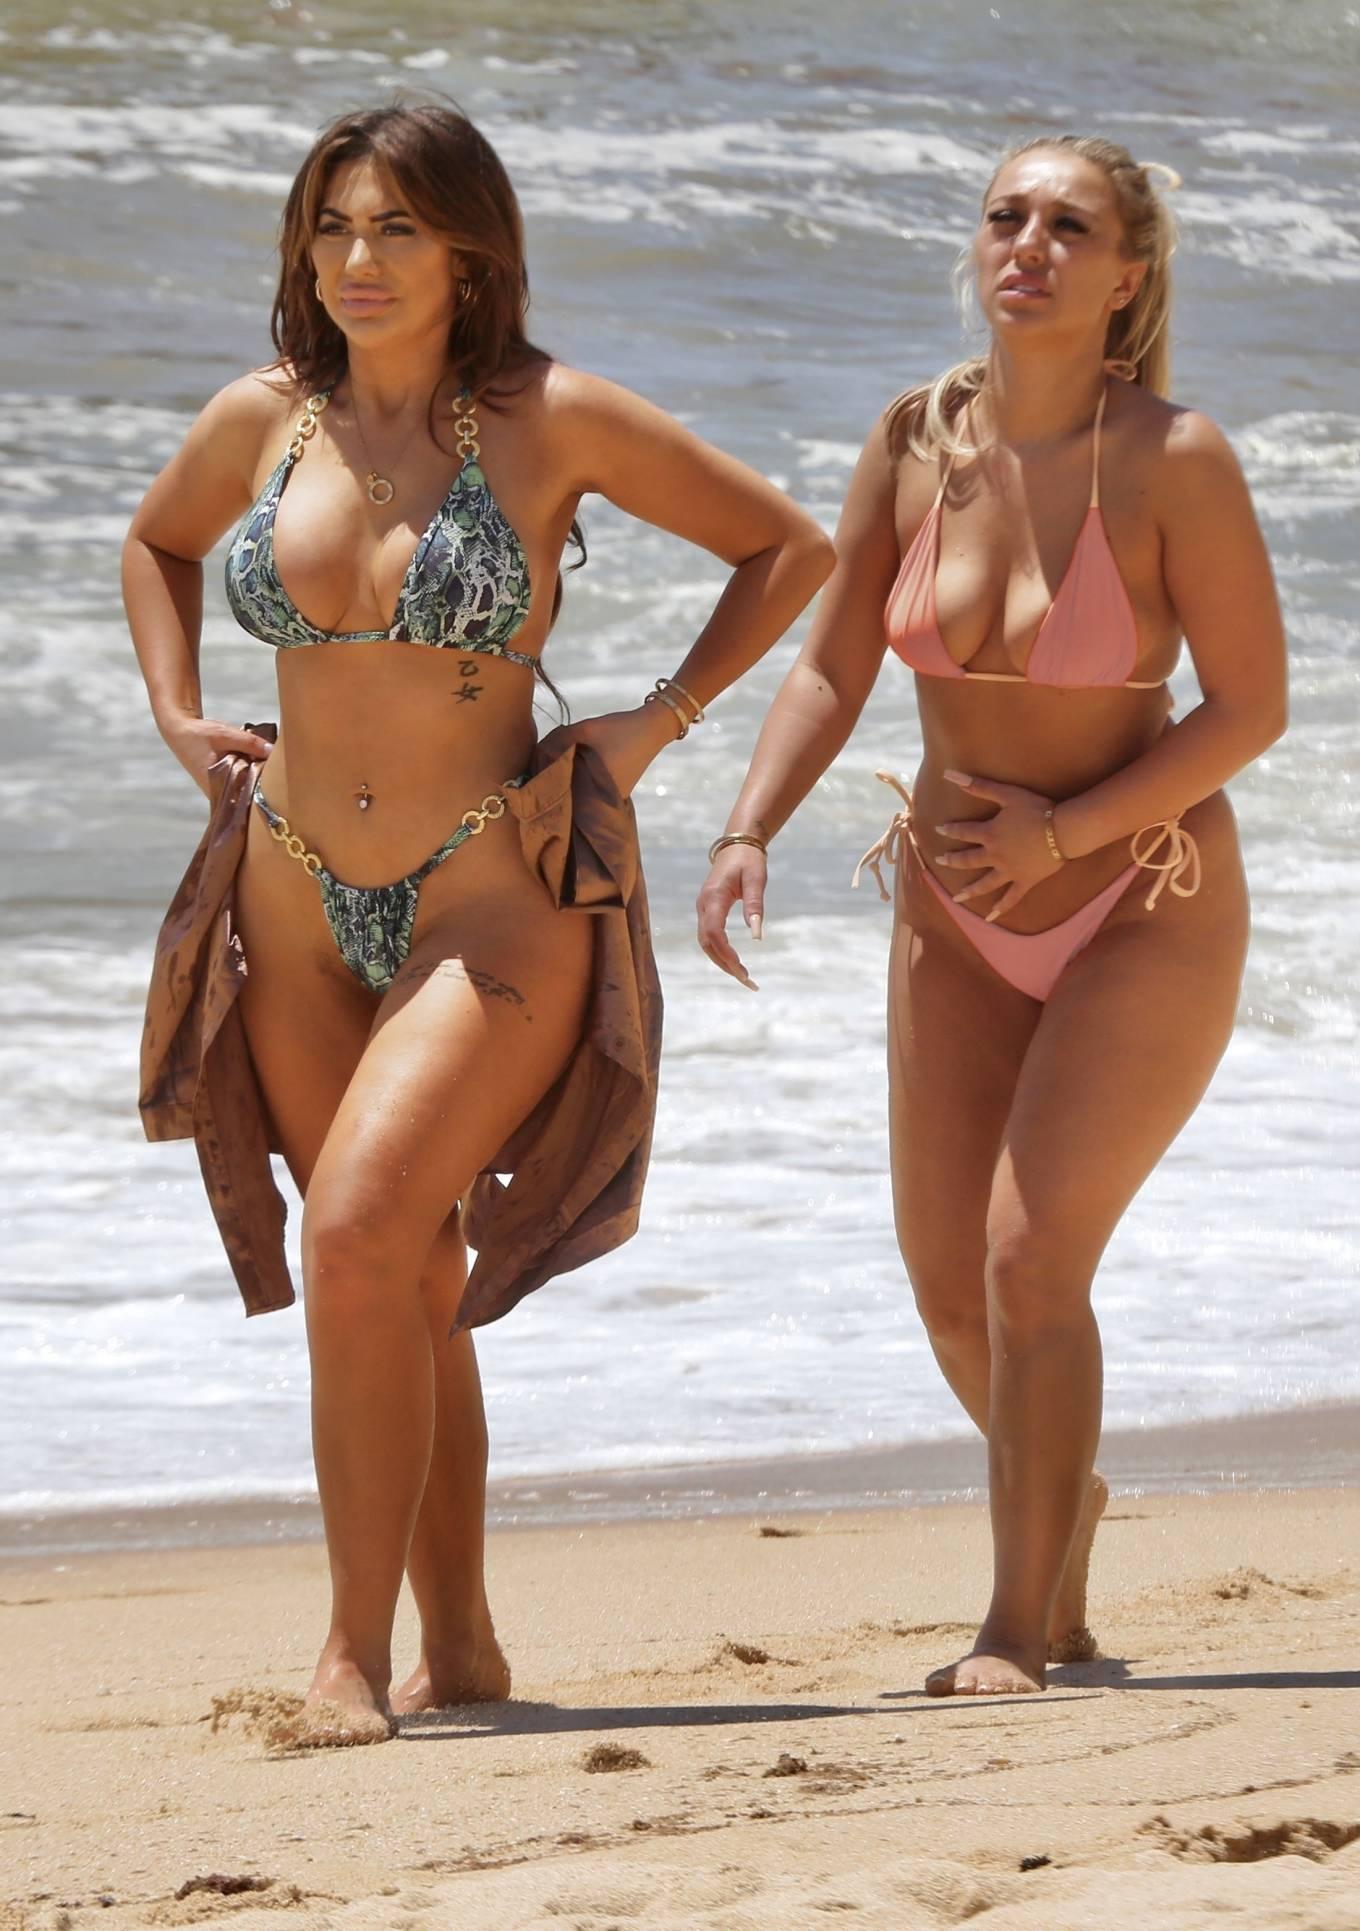 Chloe Ferry - With Bethan Kershaw bikini on the beaches of Portugal